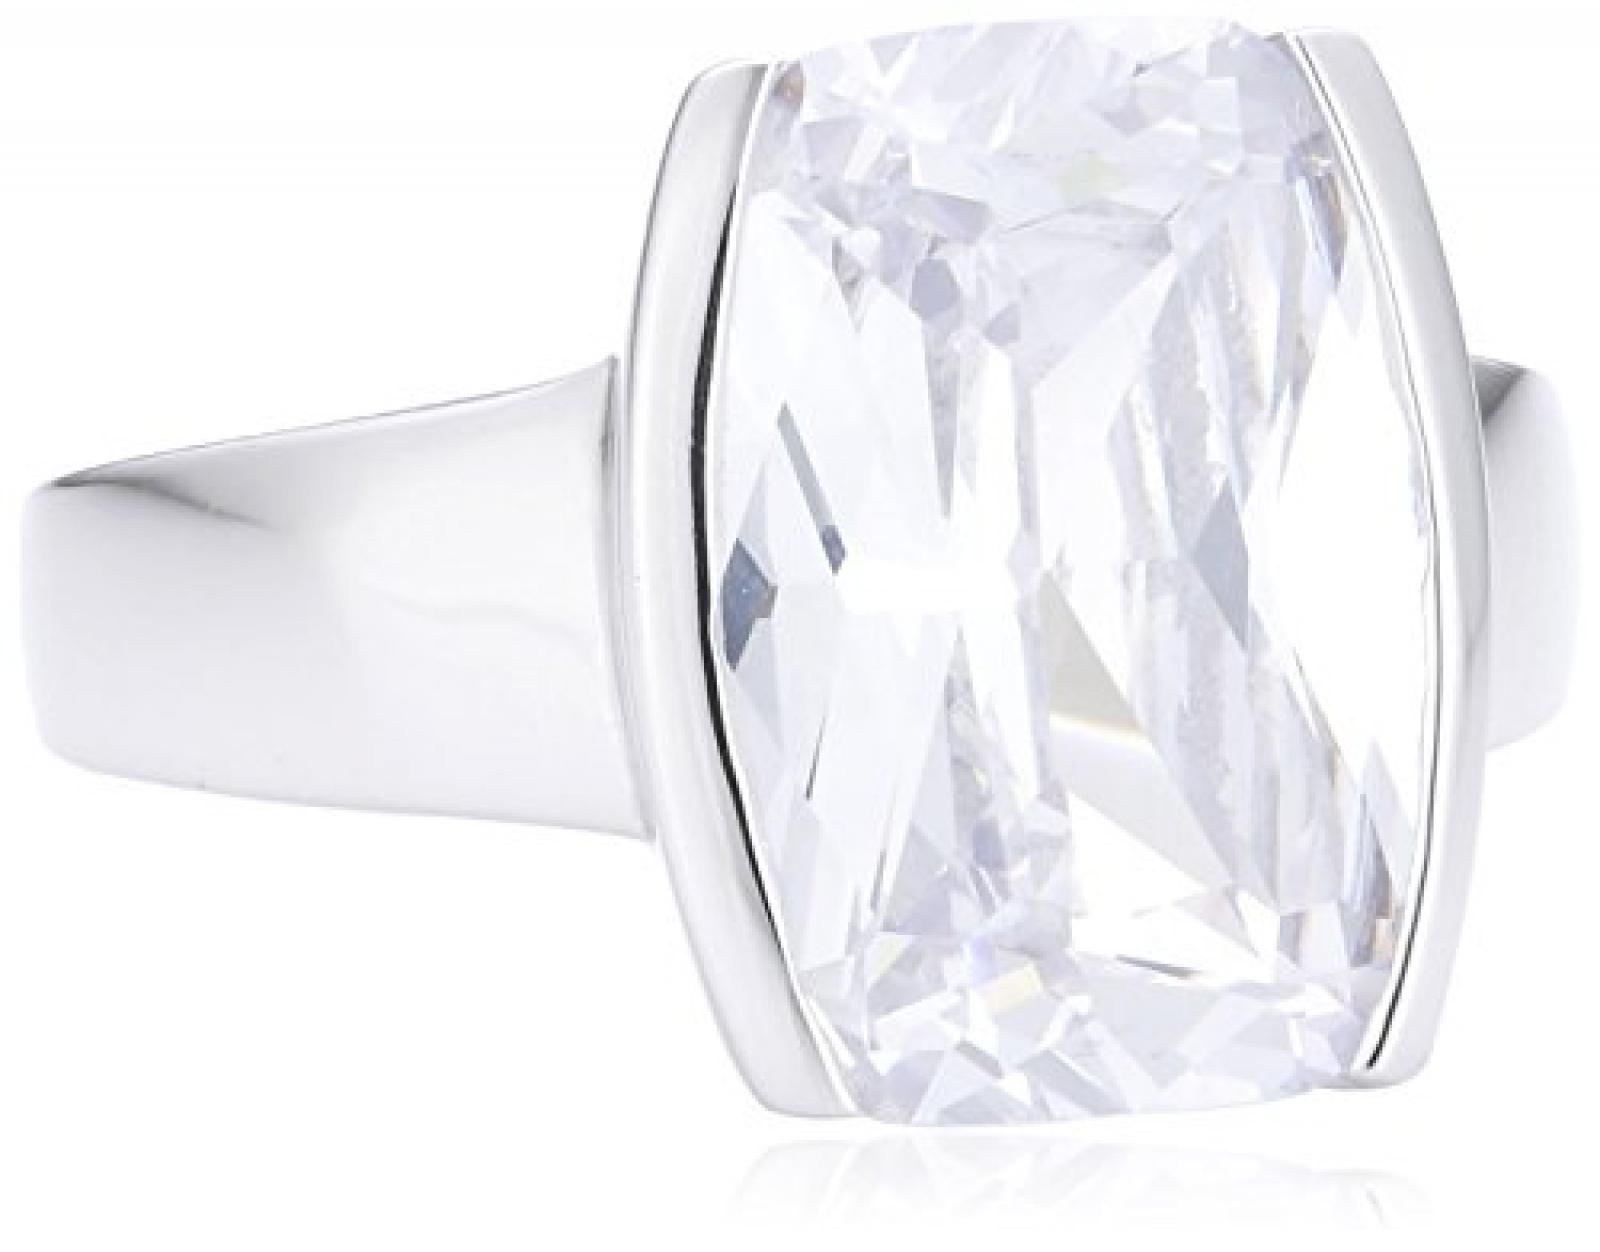 Celesta Damen-Ring 925 Sterling Silber Zirkonia weiß Gr. 53 (16.9) 273270779-9-017